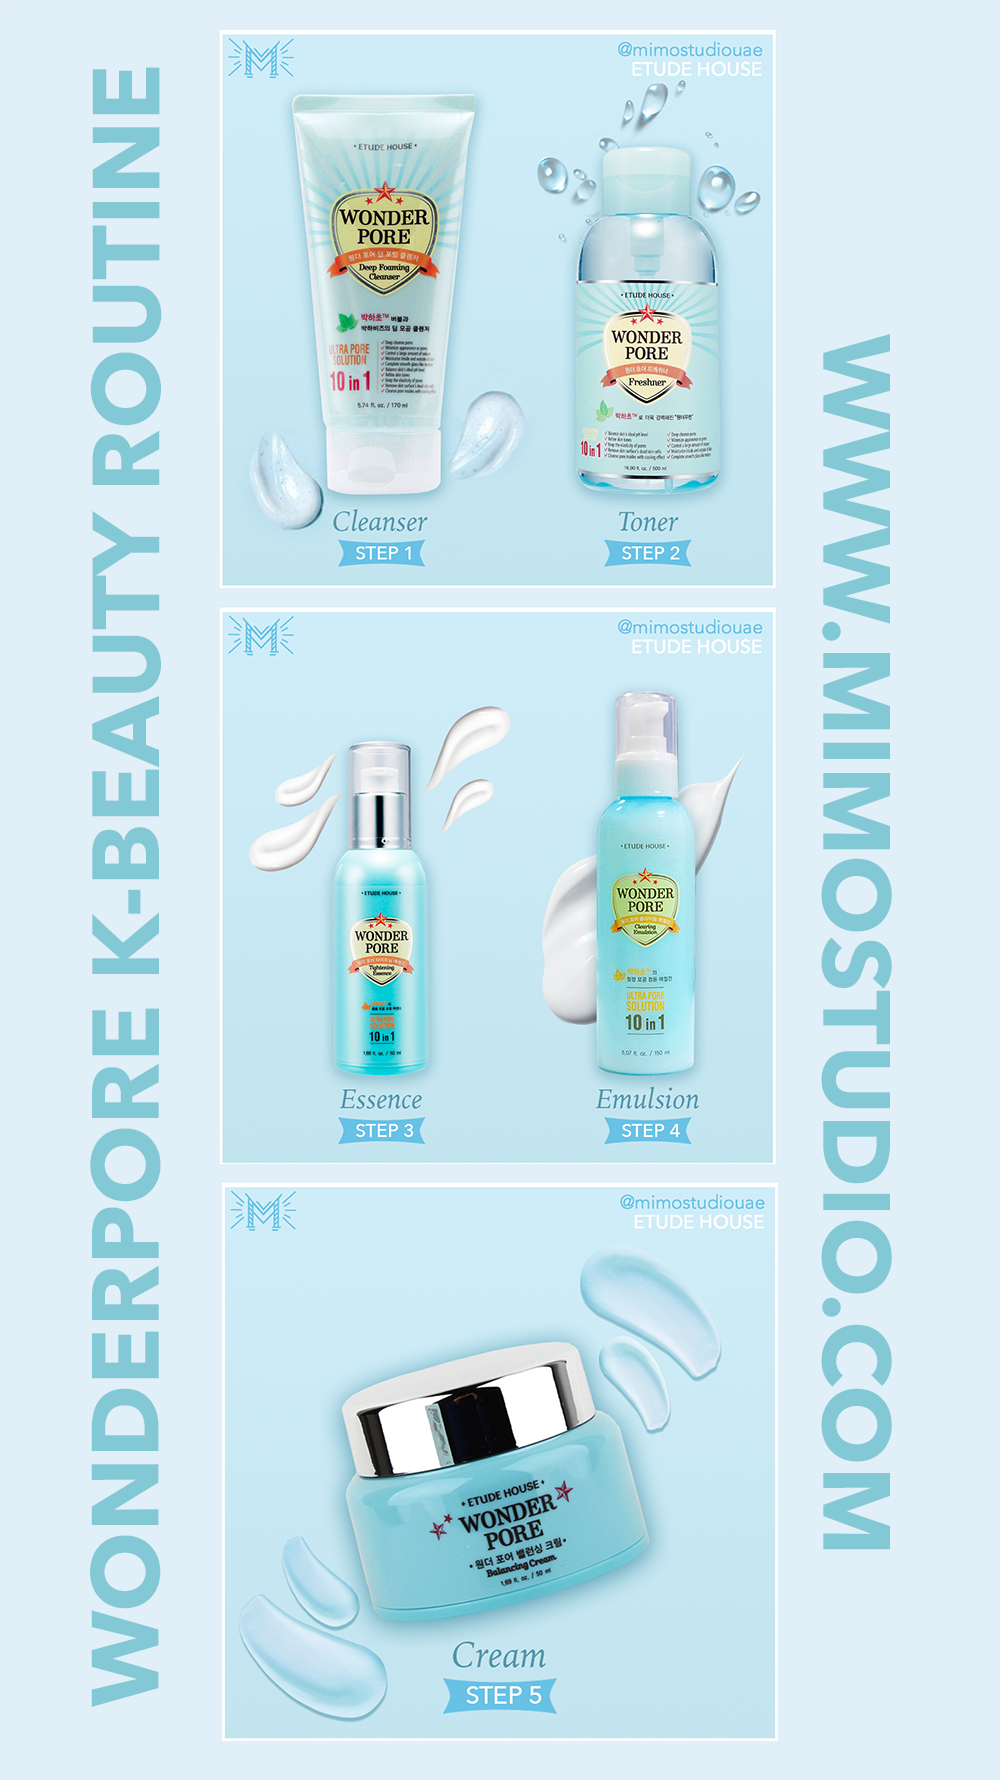 Etude House Wonder Pore Skincare Routine Step 1 Deep Cleansing Foam Step 2 Freshener Step 3 Essence Step Skin Care Routine Steps Wonder Pore Cleanser And Toner